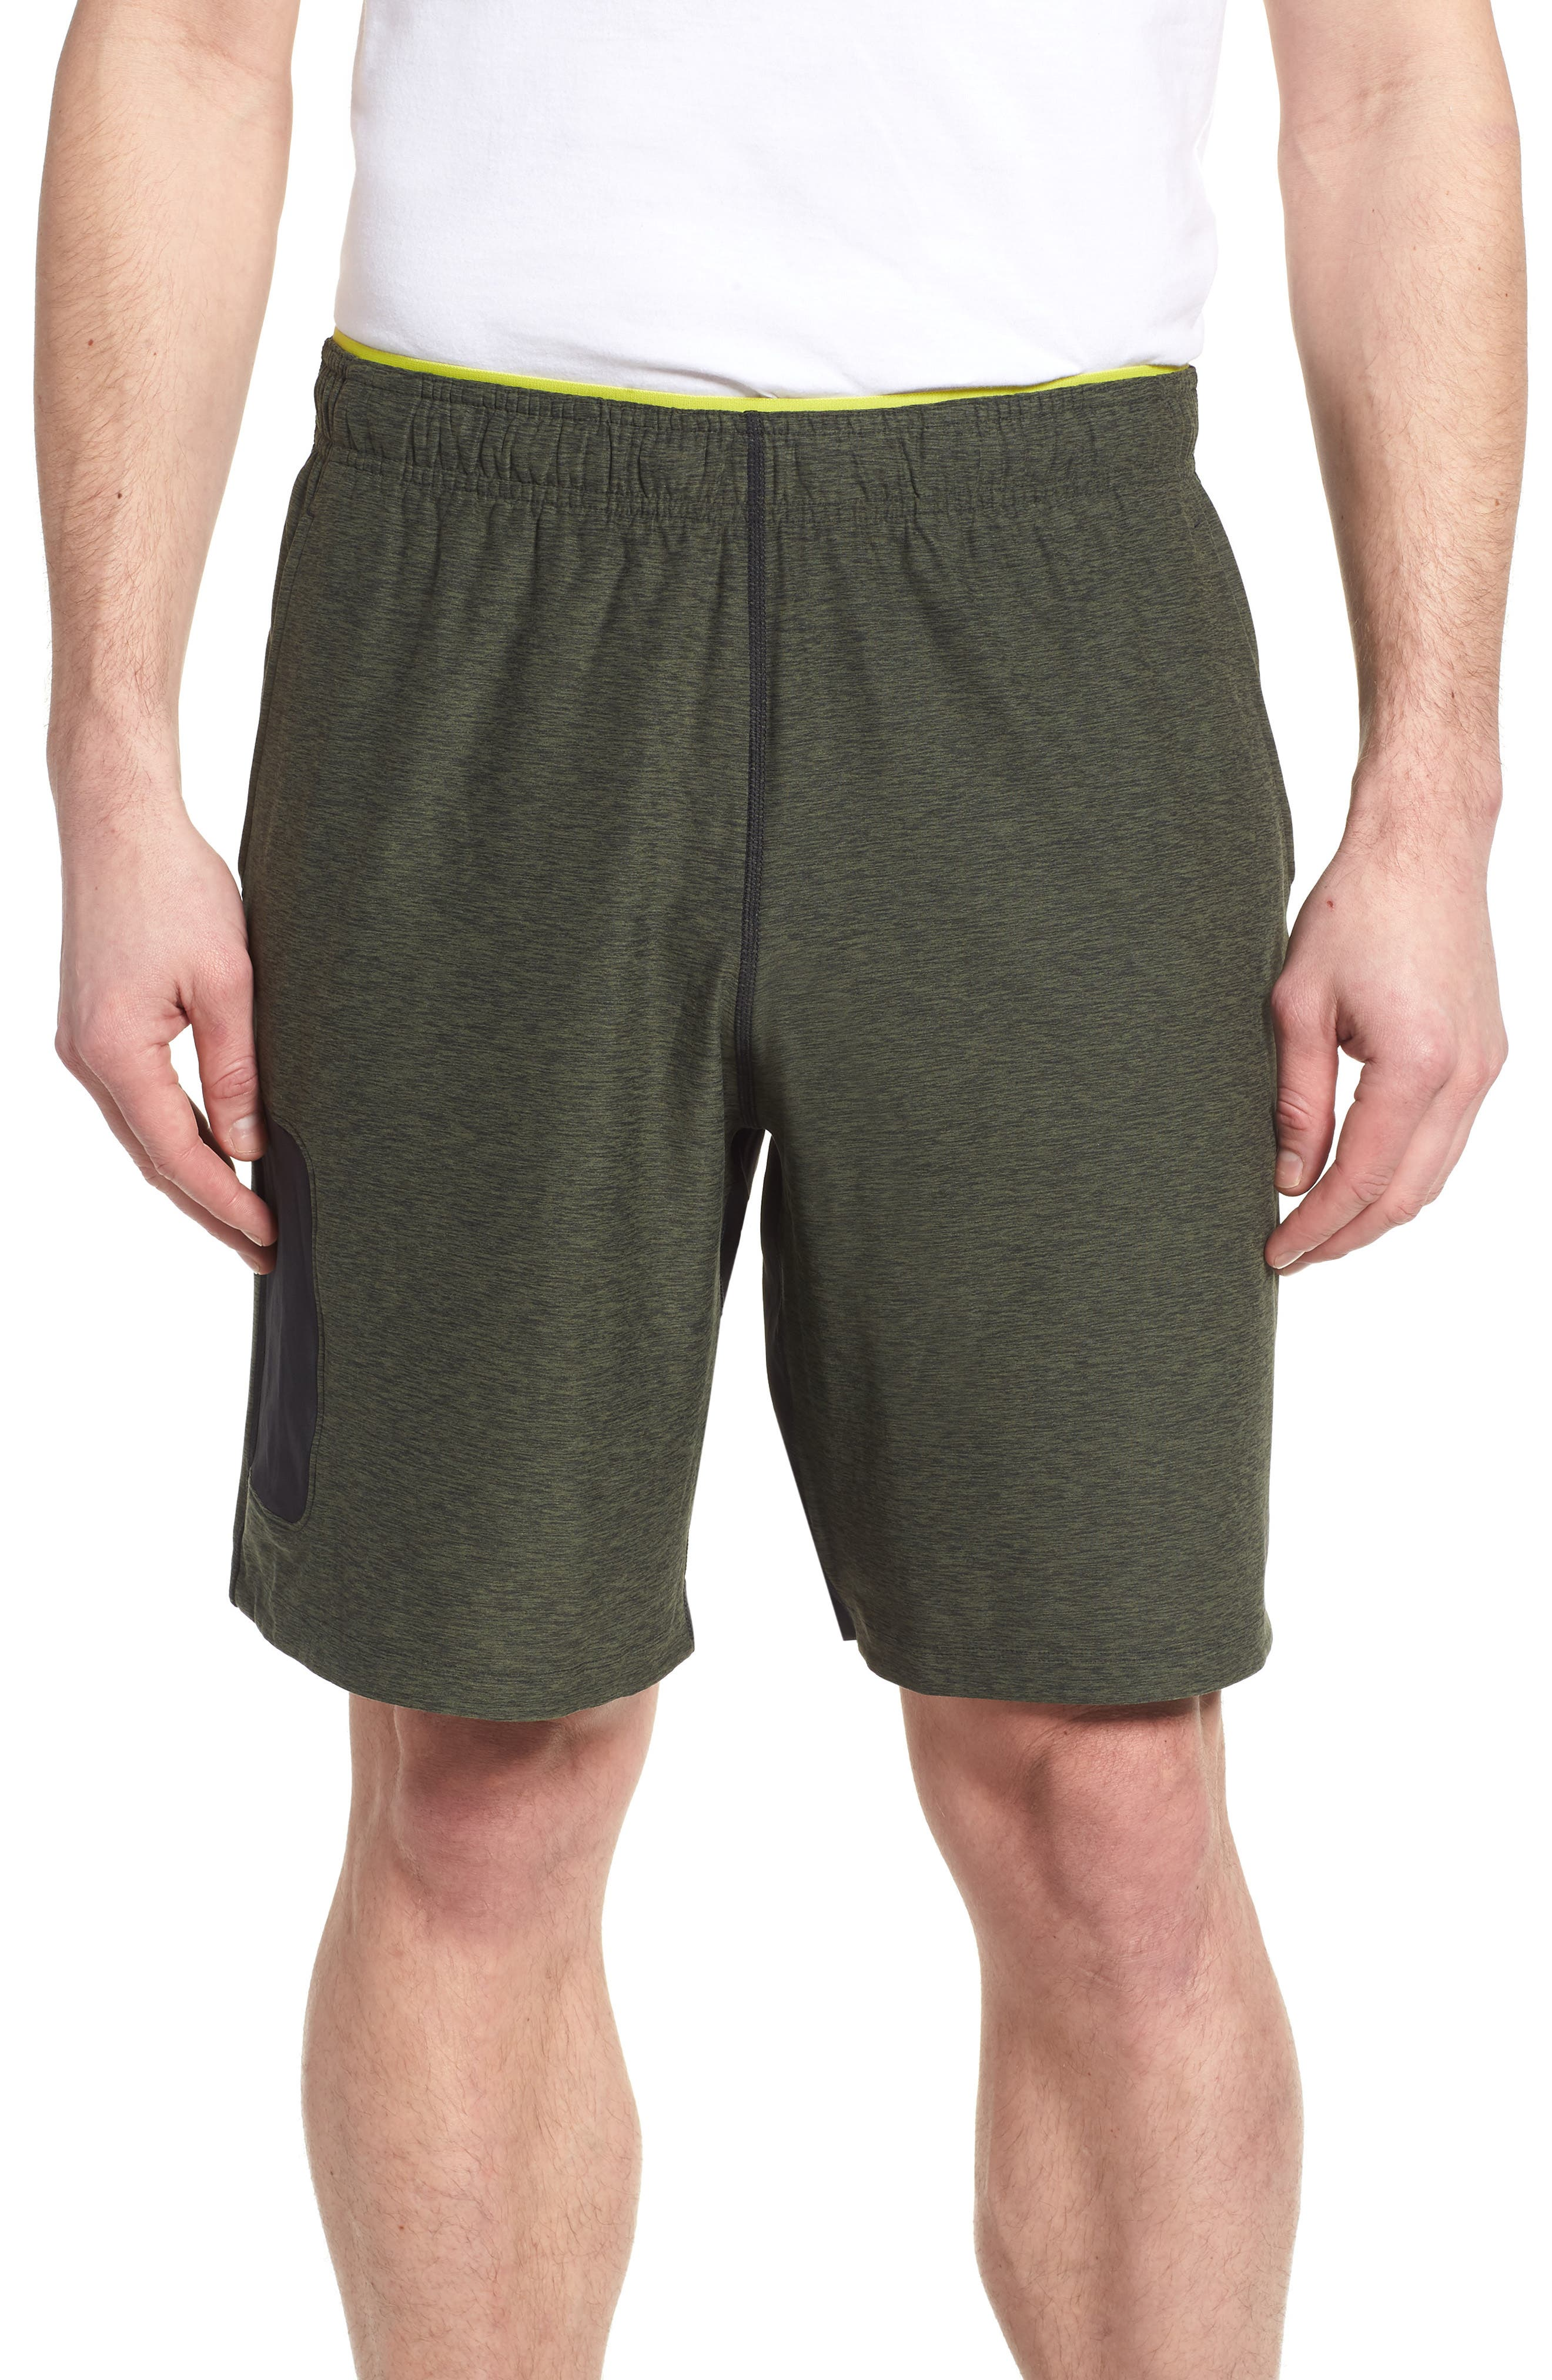 Anticipate Shorts,                         Main,                         color, Dark Covert Green